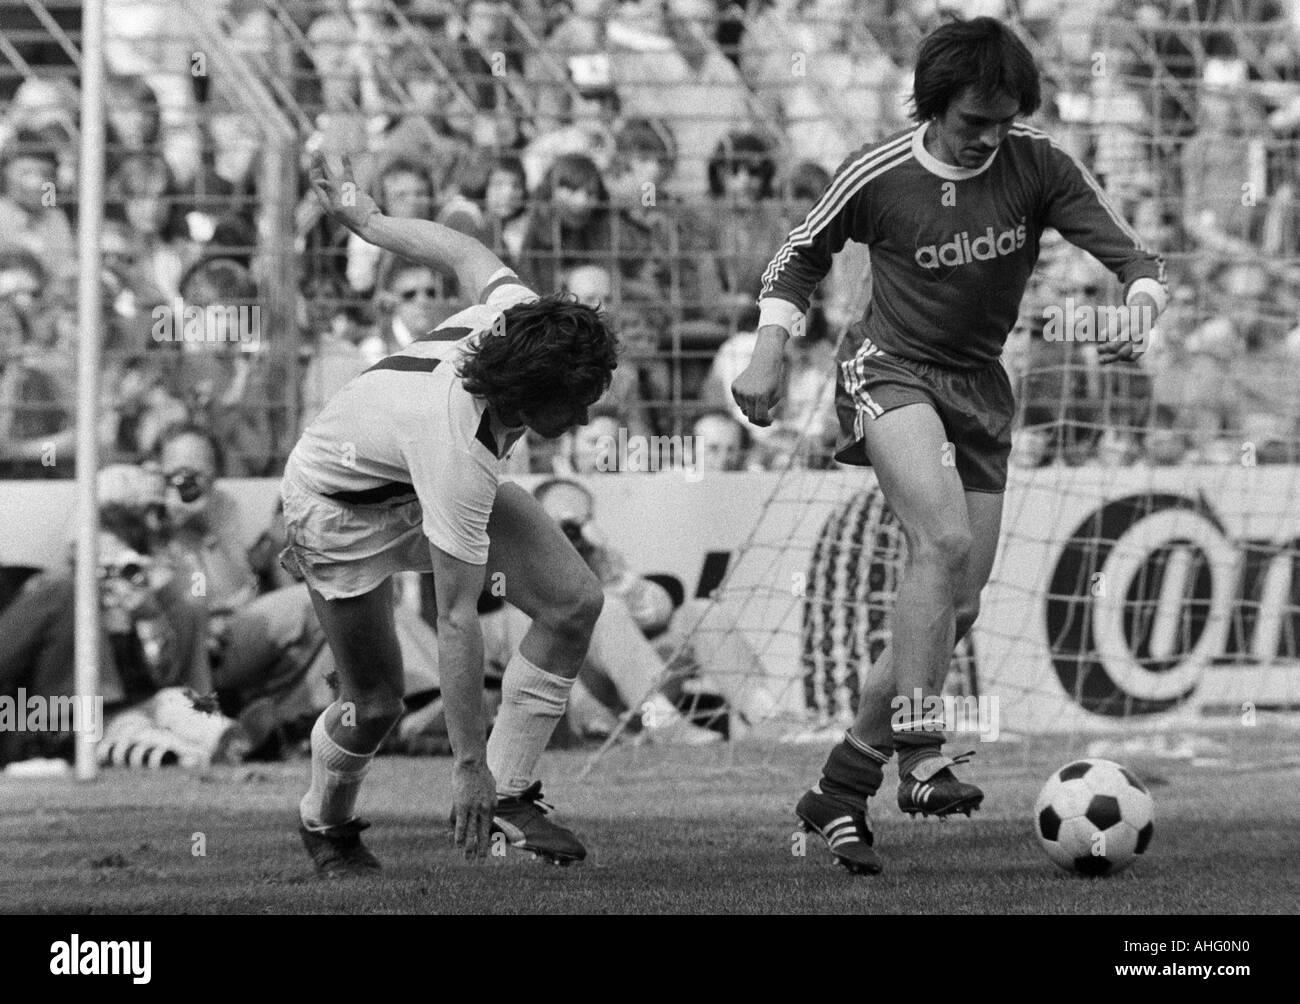 football, Bundesliga, 1973/1974, Borussia Moenchengladbach versus FC Bayern Munich 5:0, Boekelberg Stadium, scene of the match, duel between Jupp Heynckes (MG) left and Jupp Kapellmann (FCB) - Stock Image